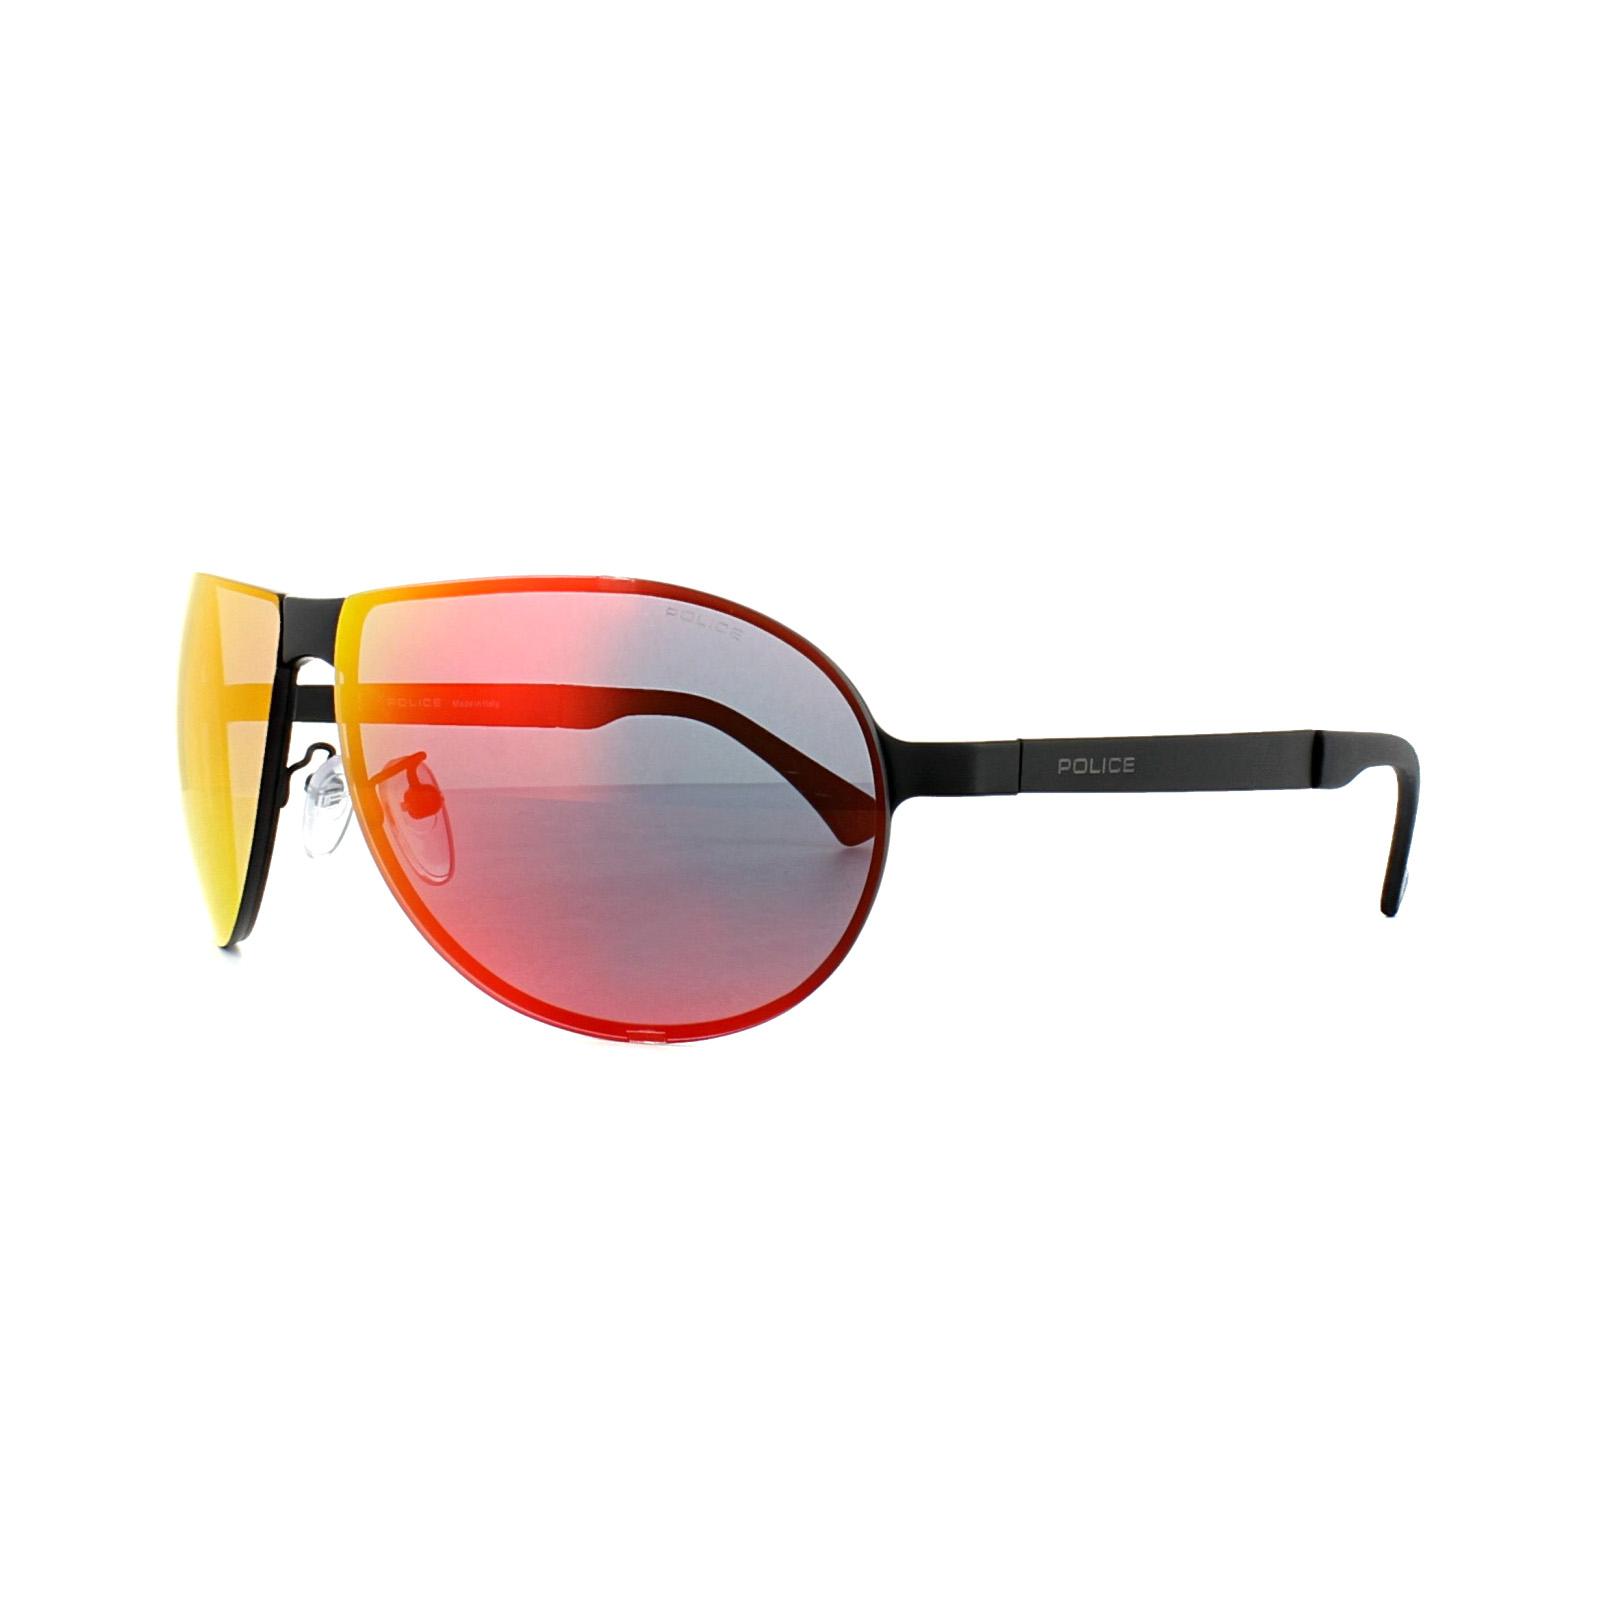 dbfa5ed5b Sentinel Police Sunglasses S8843 Cube 4 531R Matt Black Grey Mirror Red